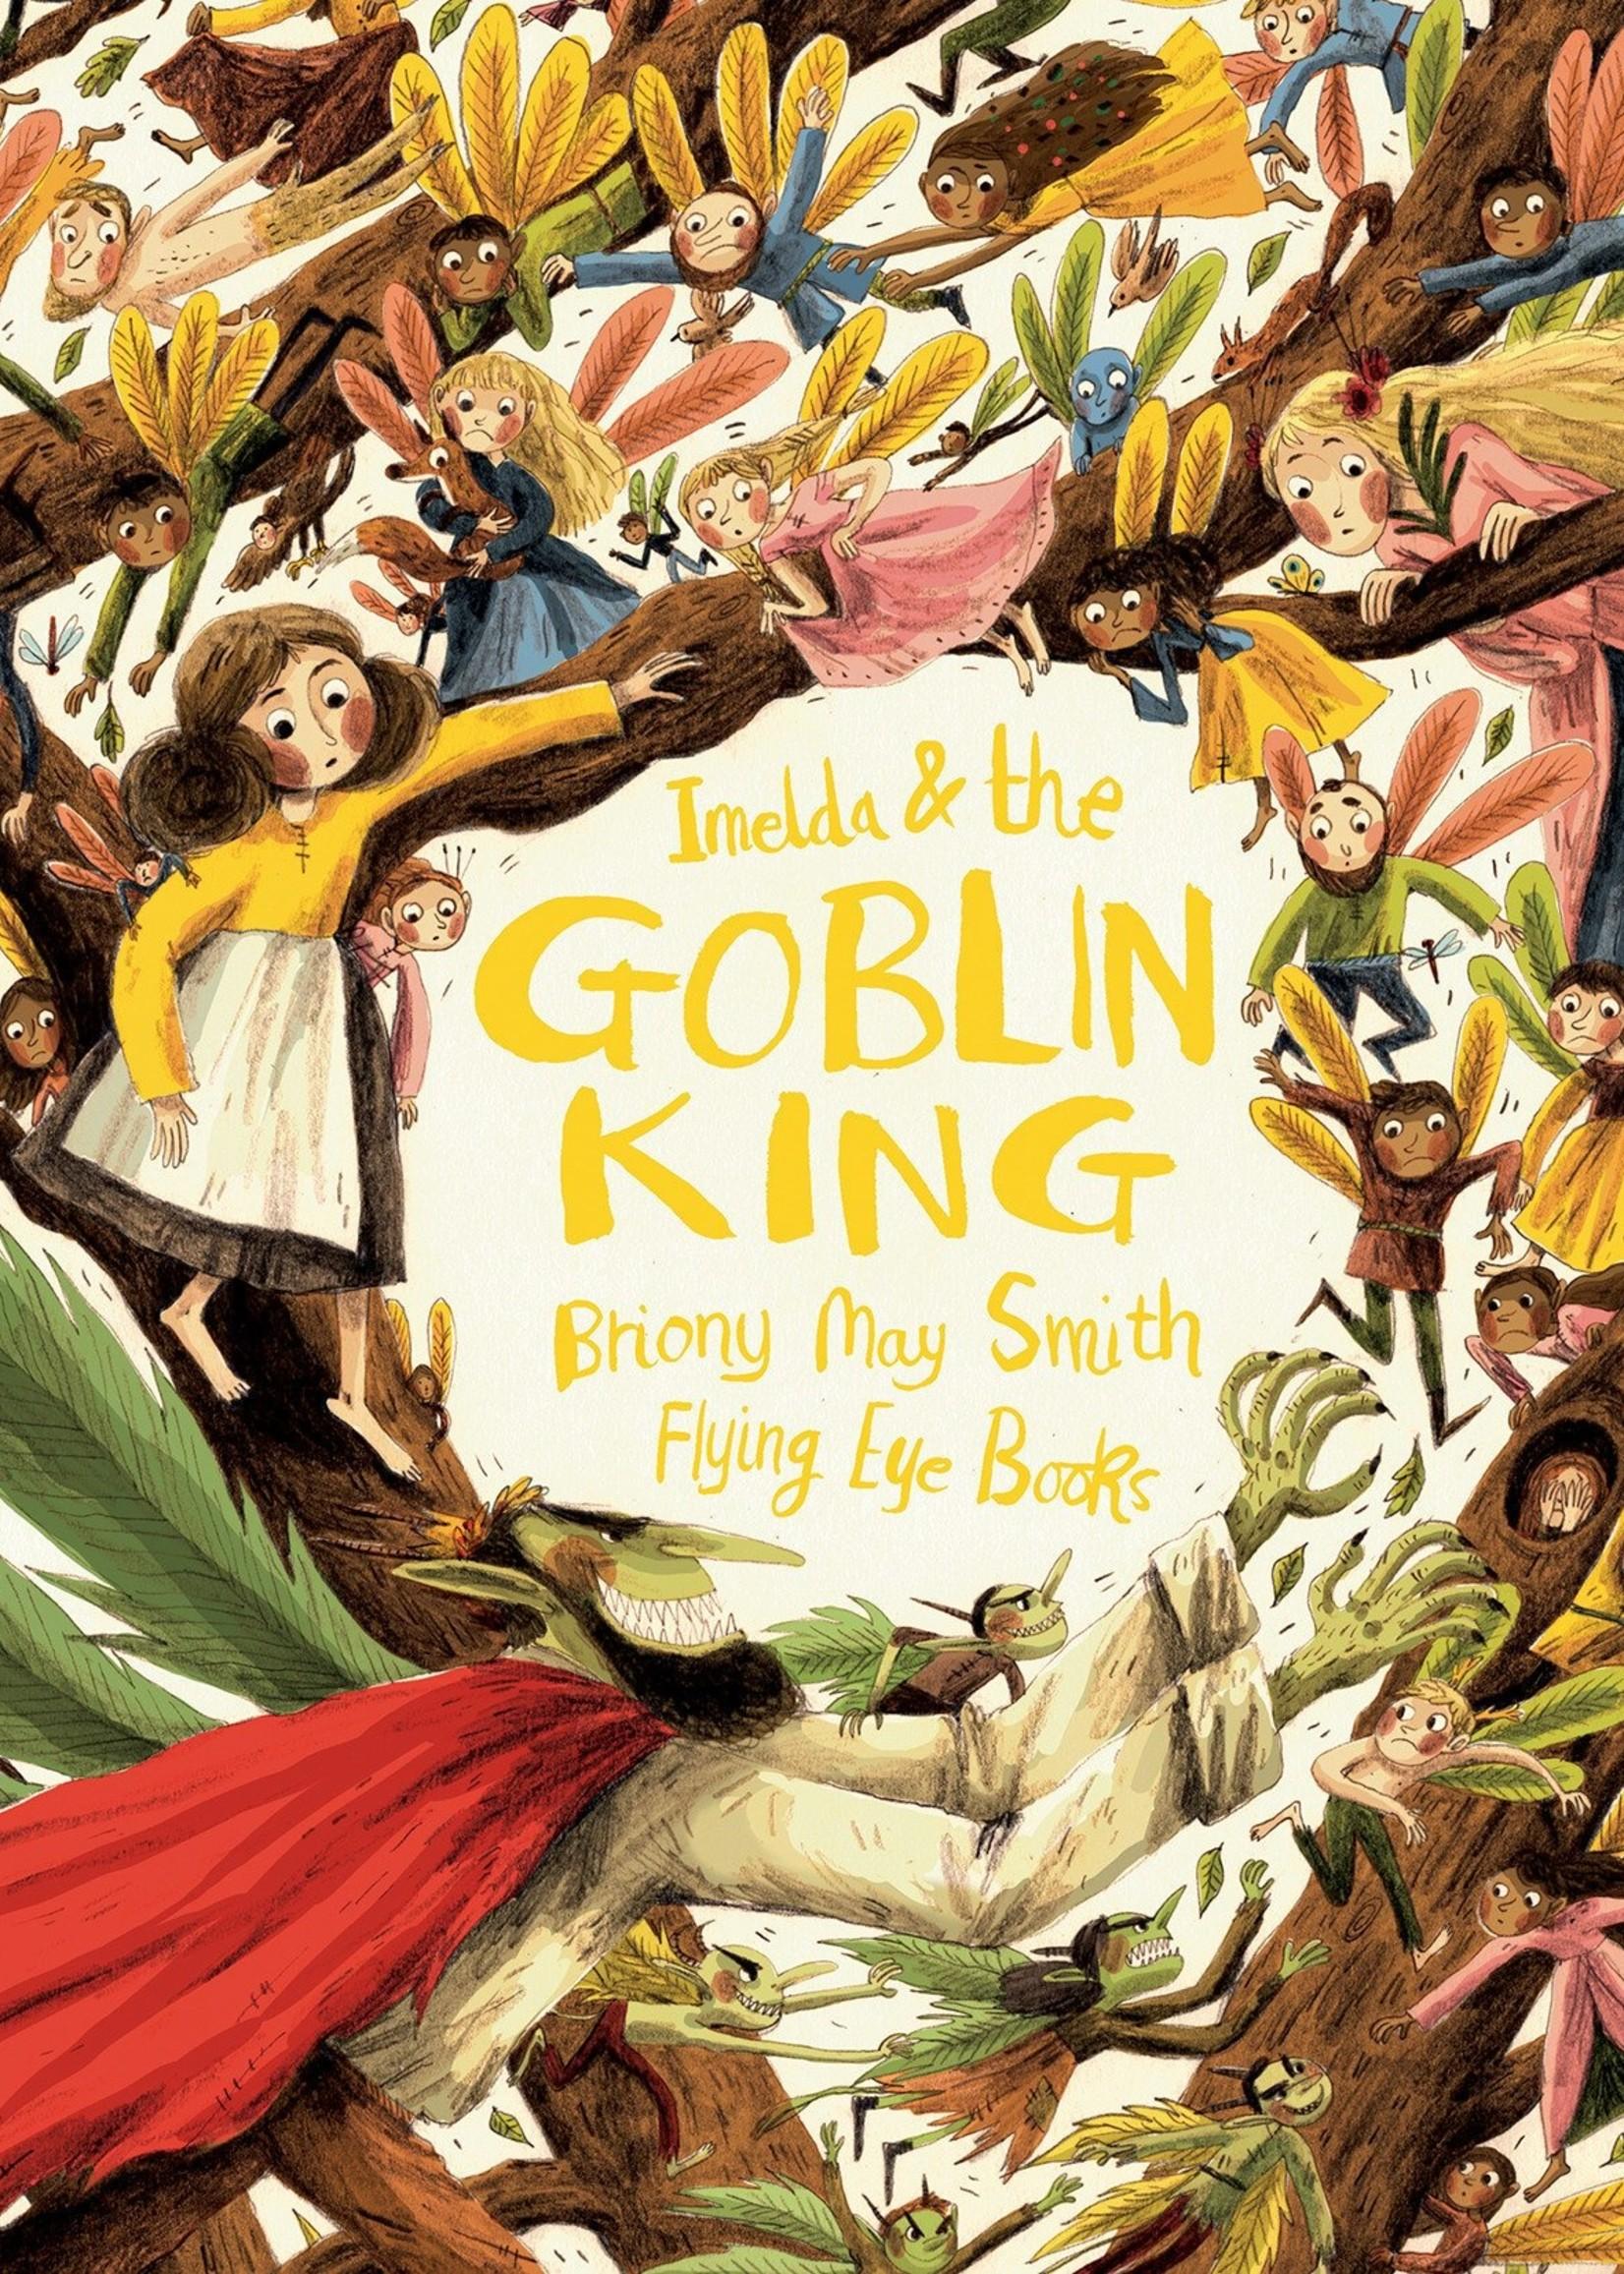 Imelda and the Goblin King - Hardcover